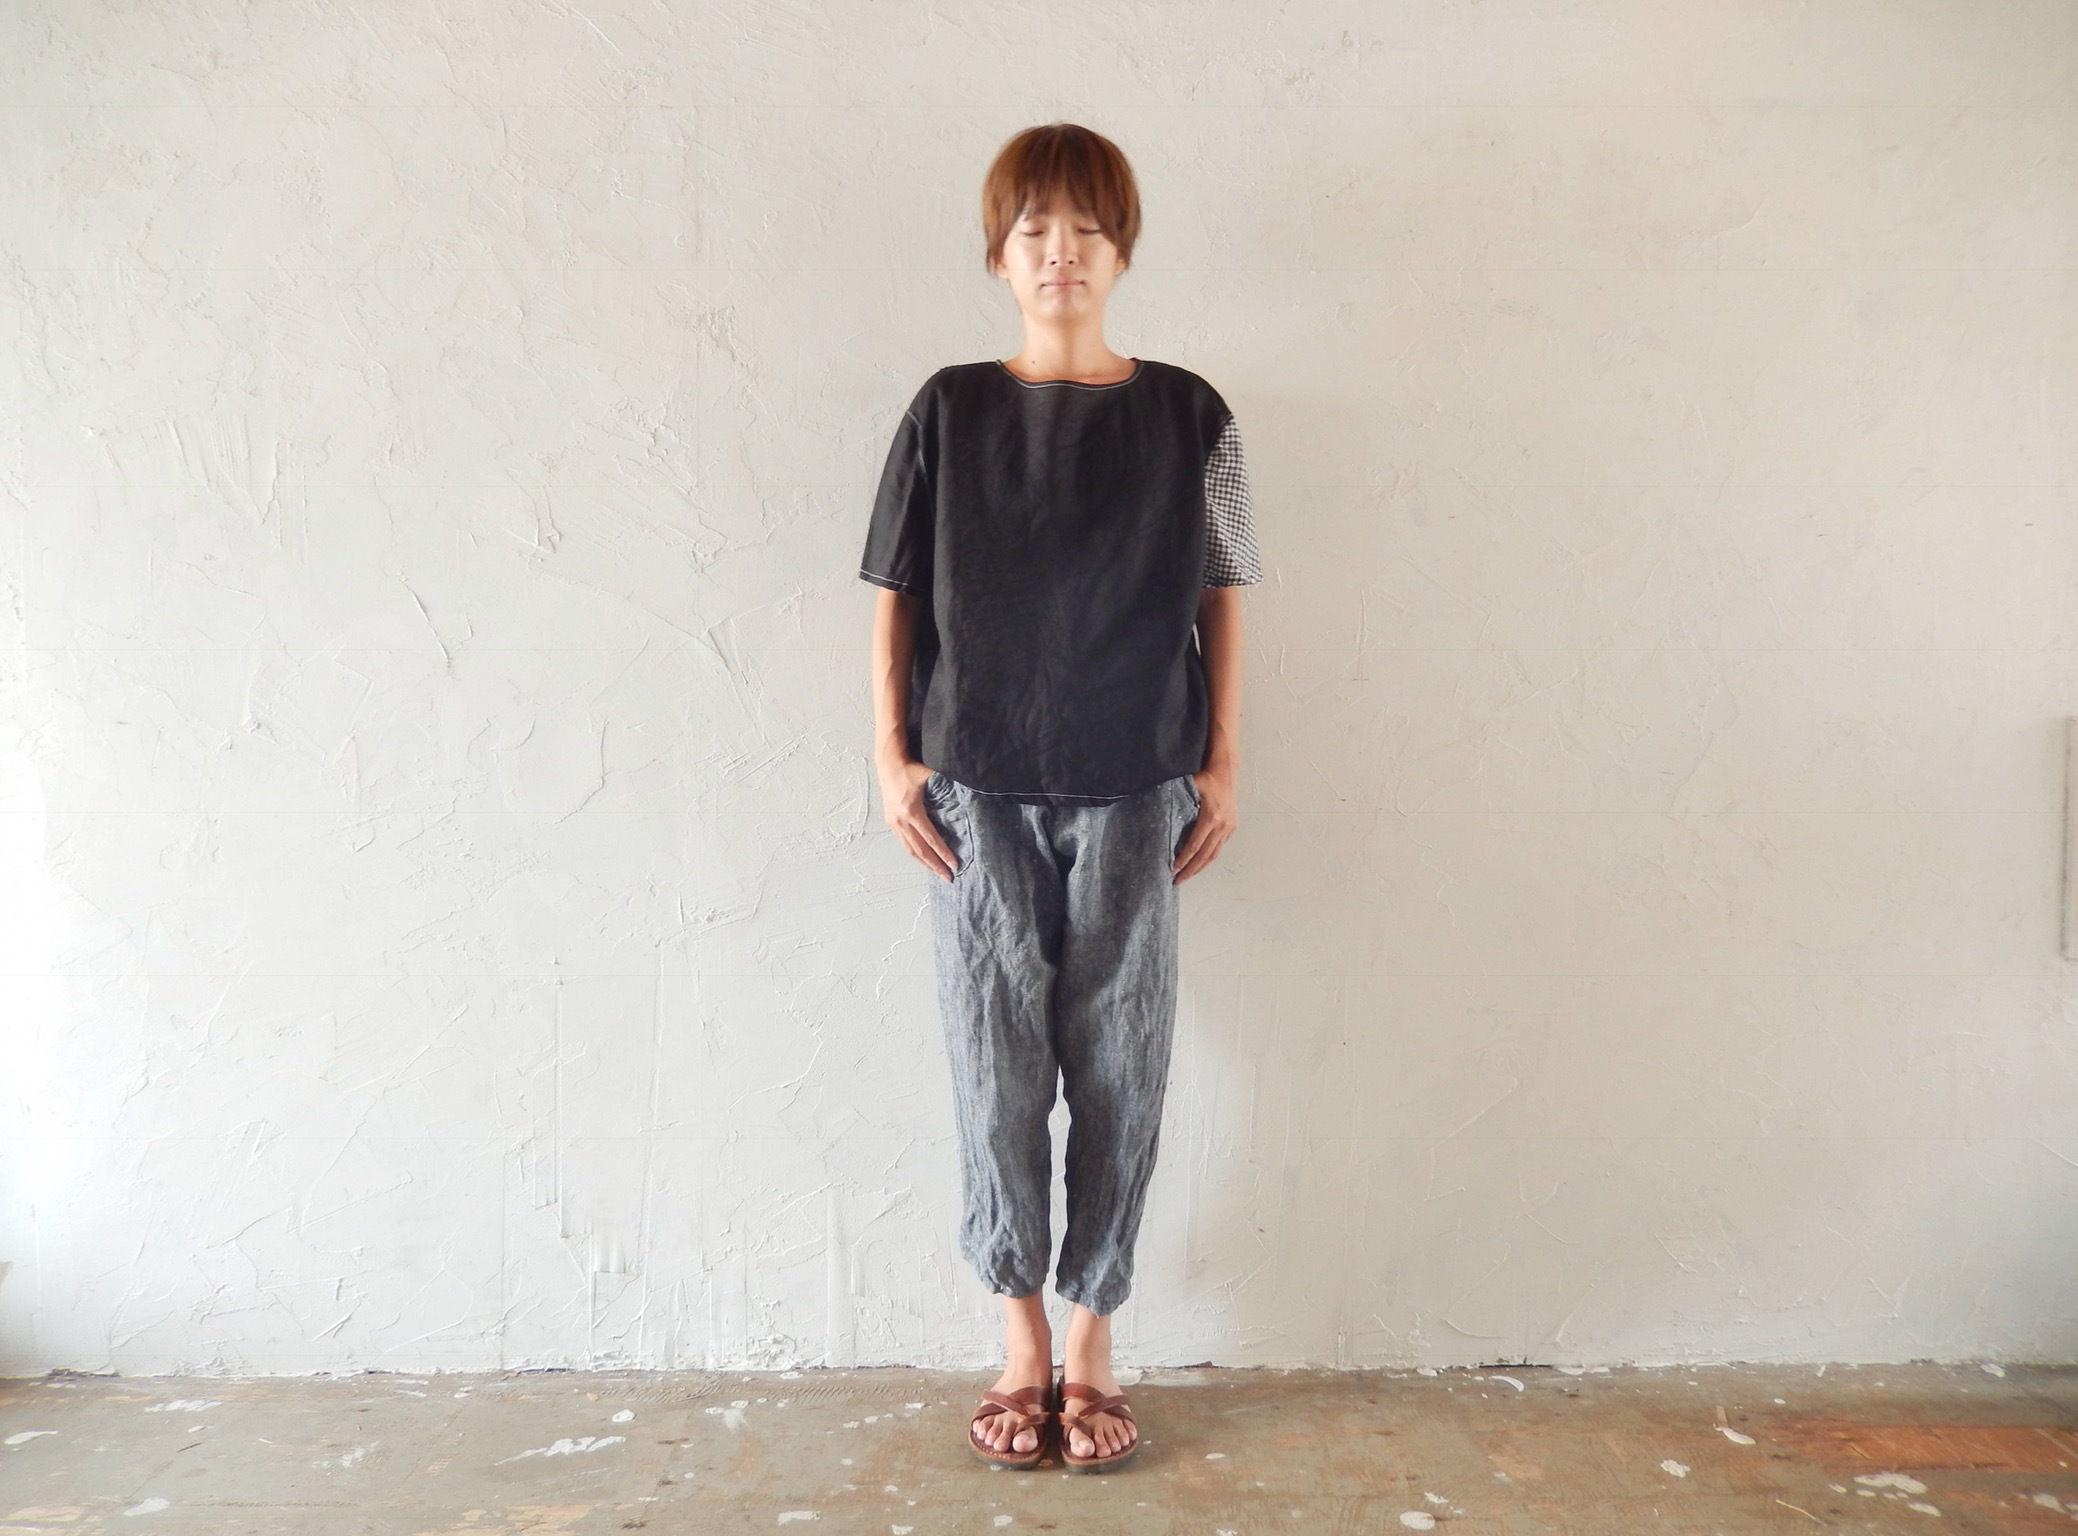 takuroh shirafuji Levain Languid 2nd [Tops : Linen : Boys ]